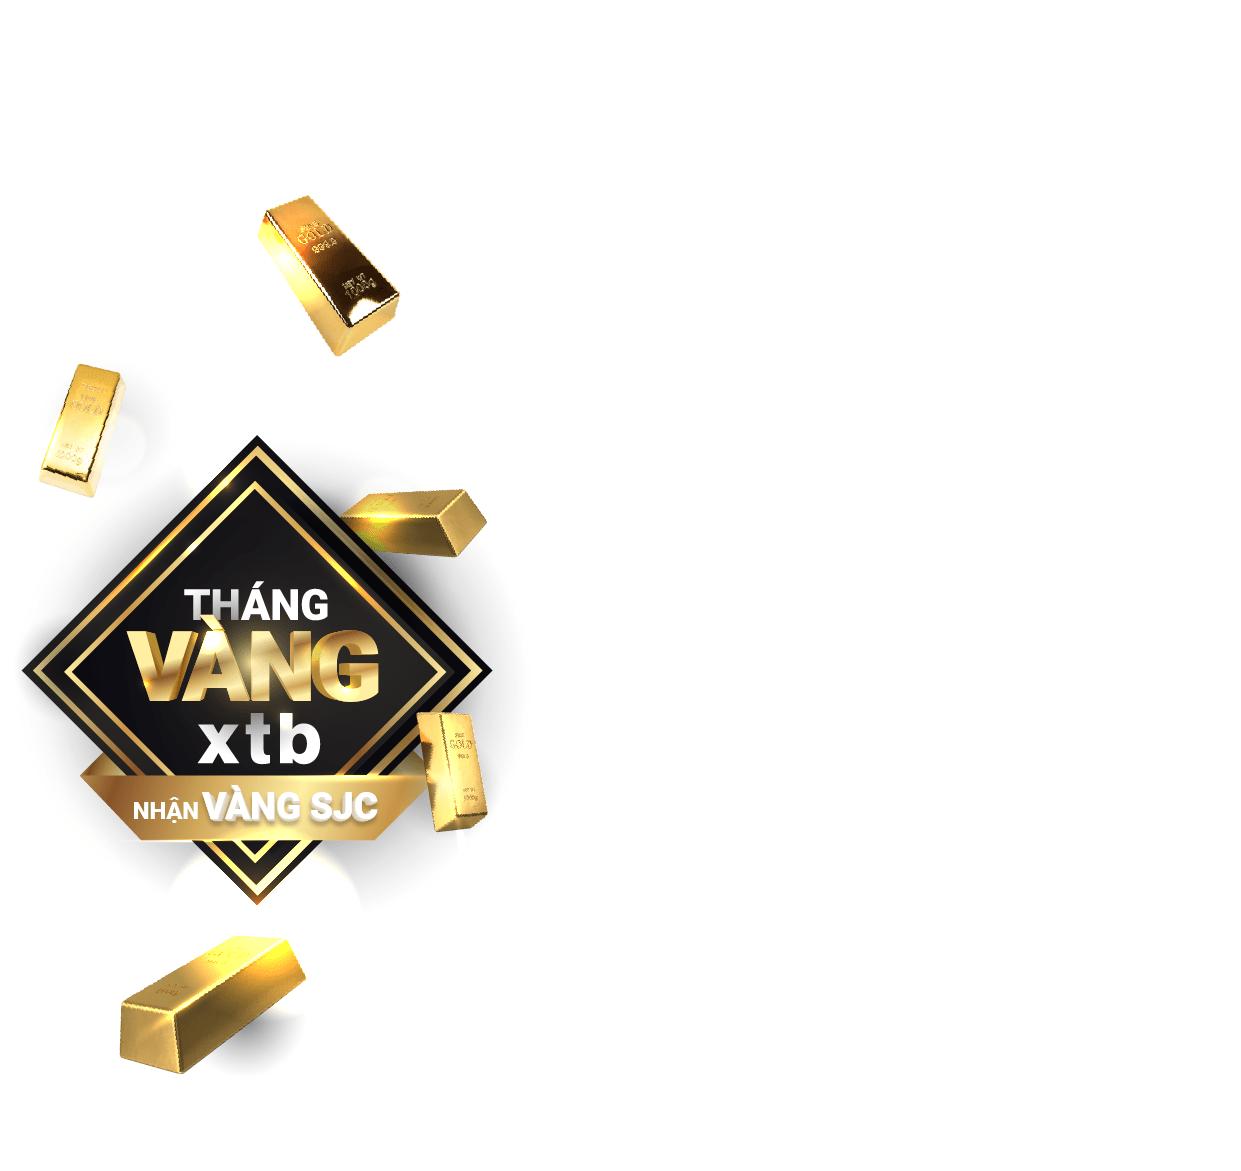 xtb - gold month SJC packshot 1240x1170-1